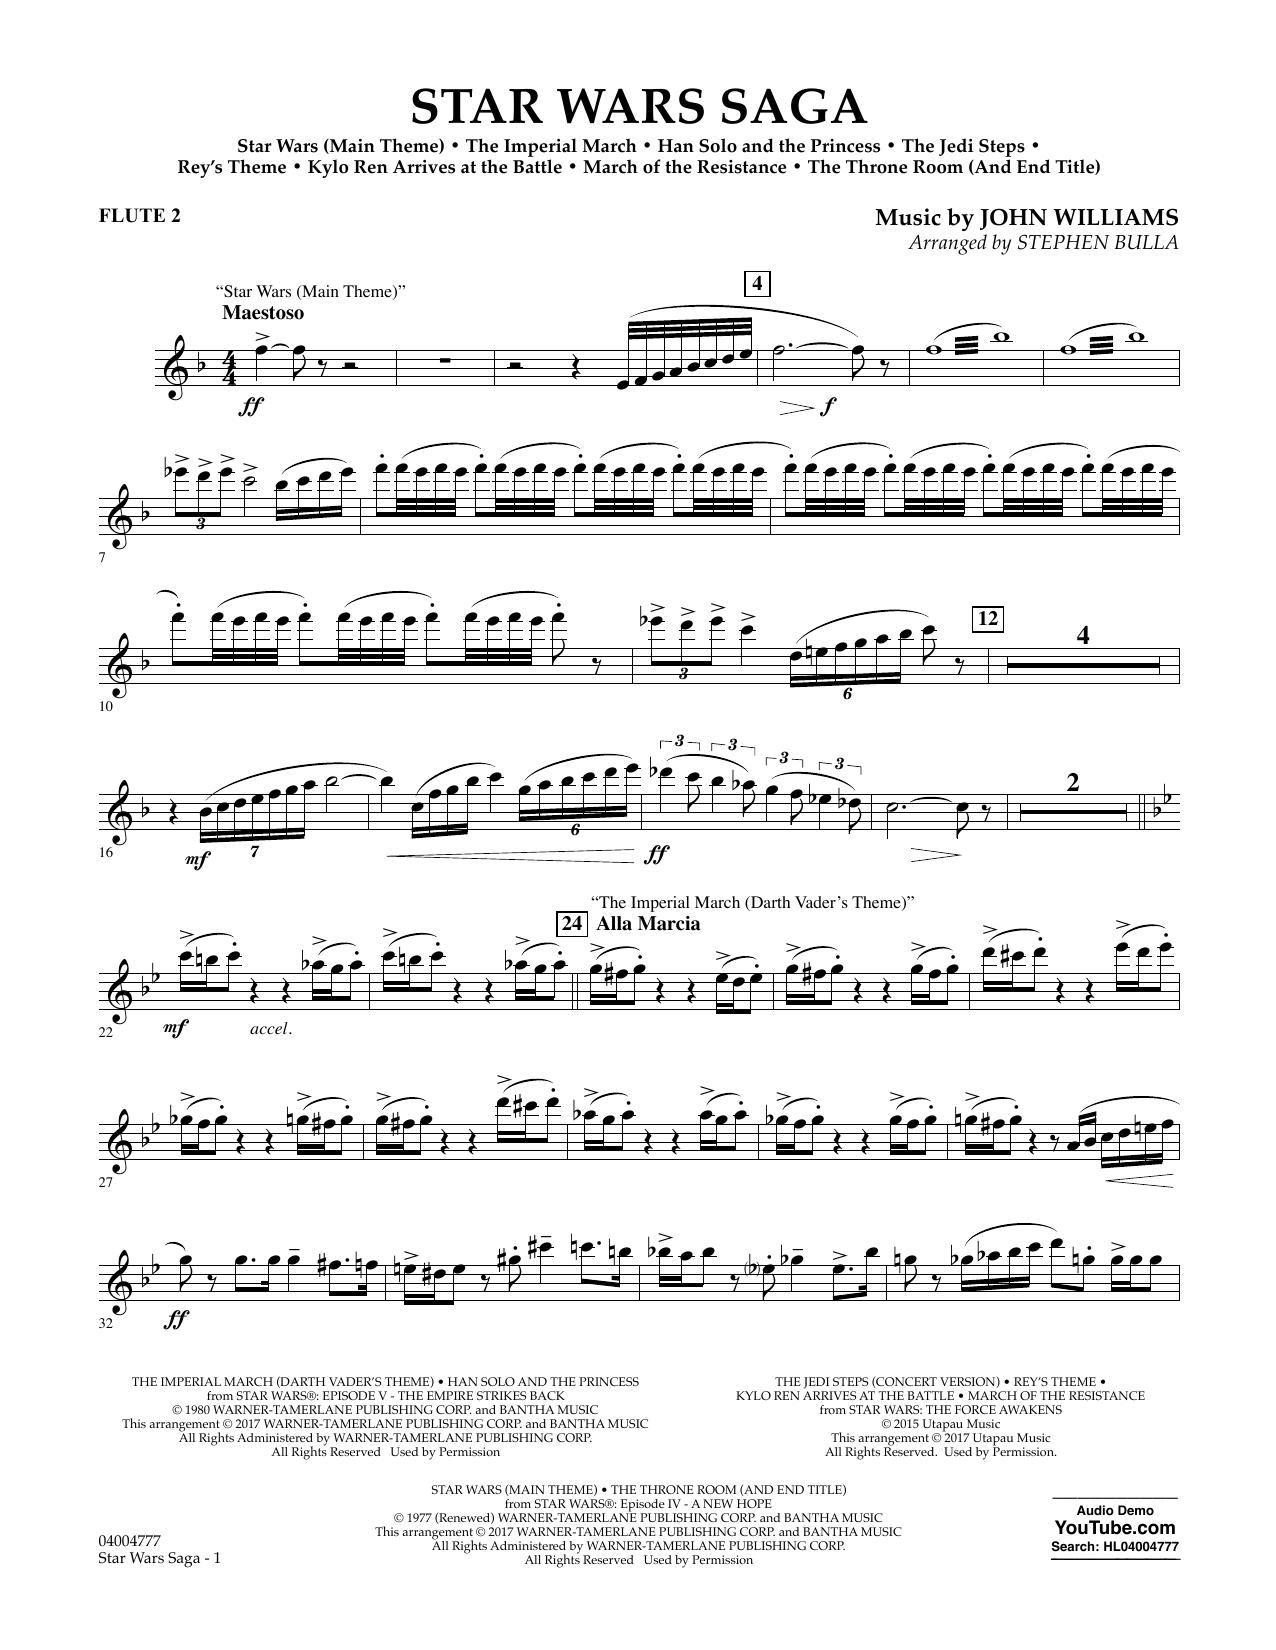 Star Wars Saga - Flute 2